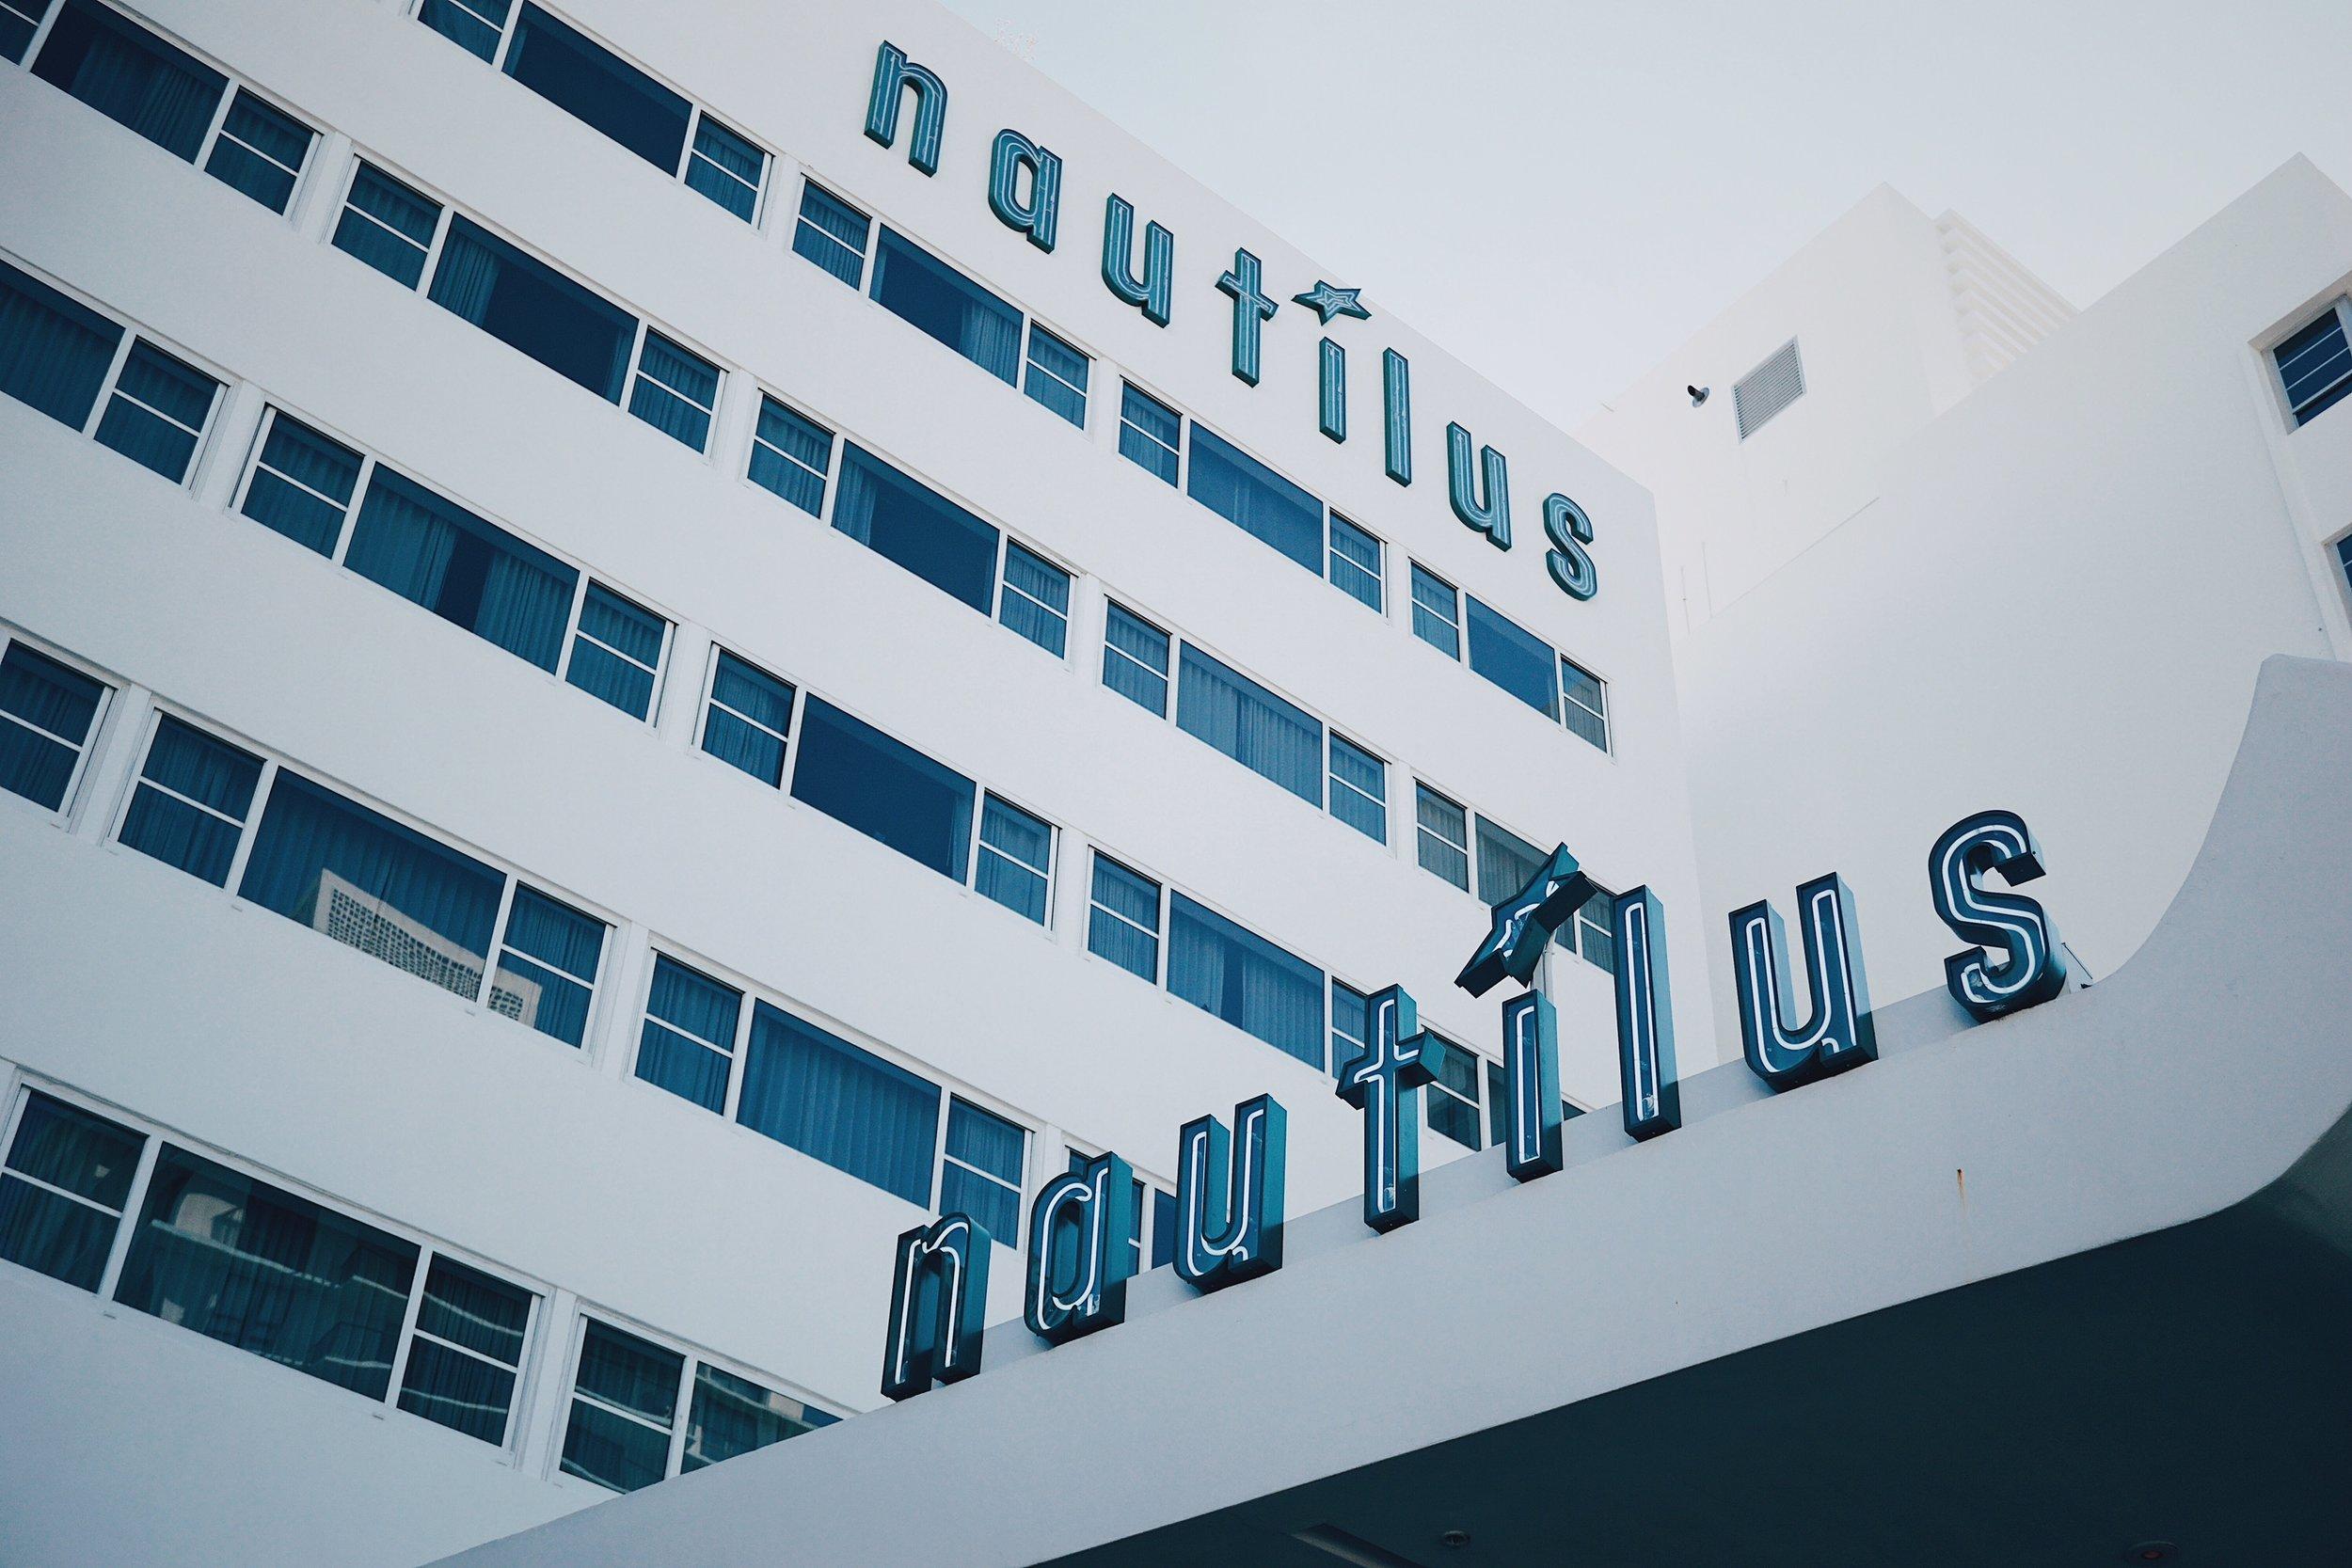 Miami Beach Hotels - Nautilus